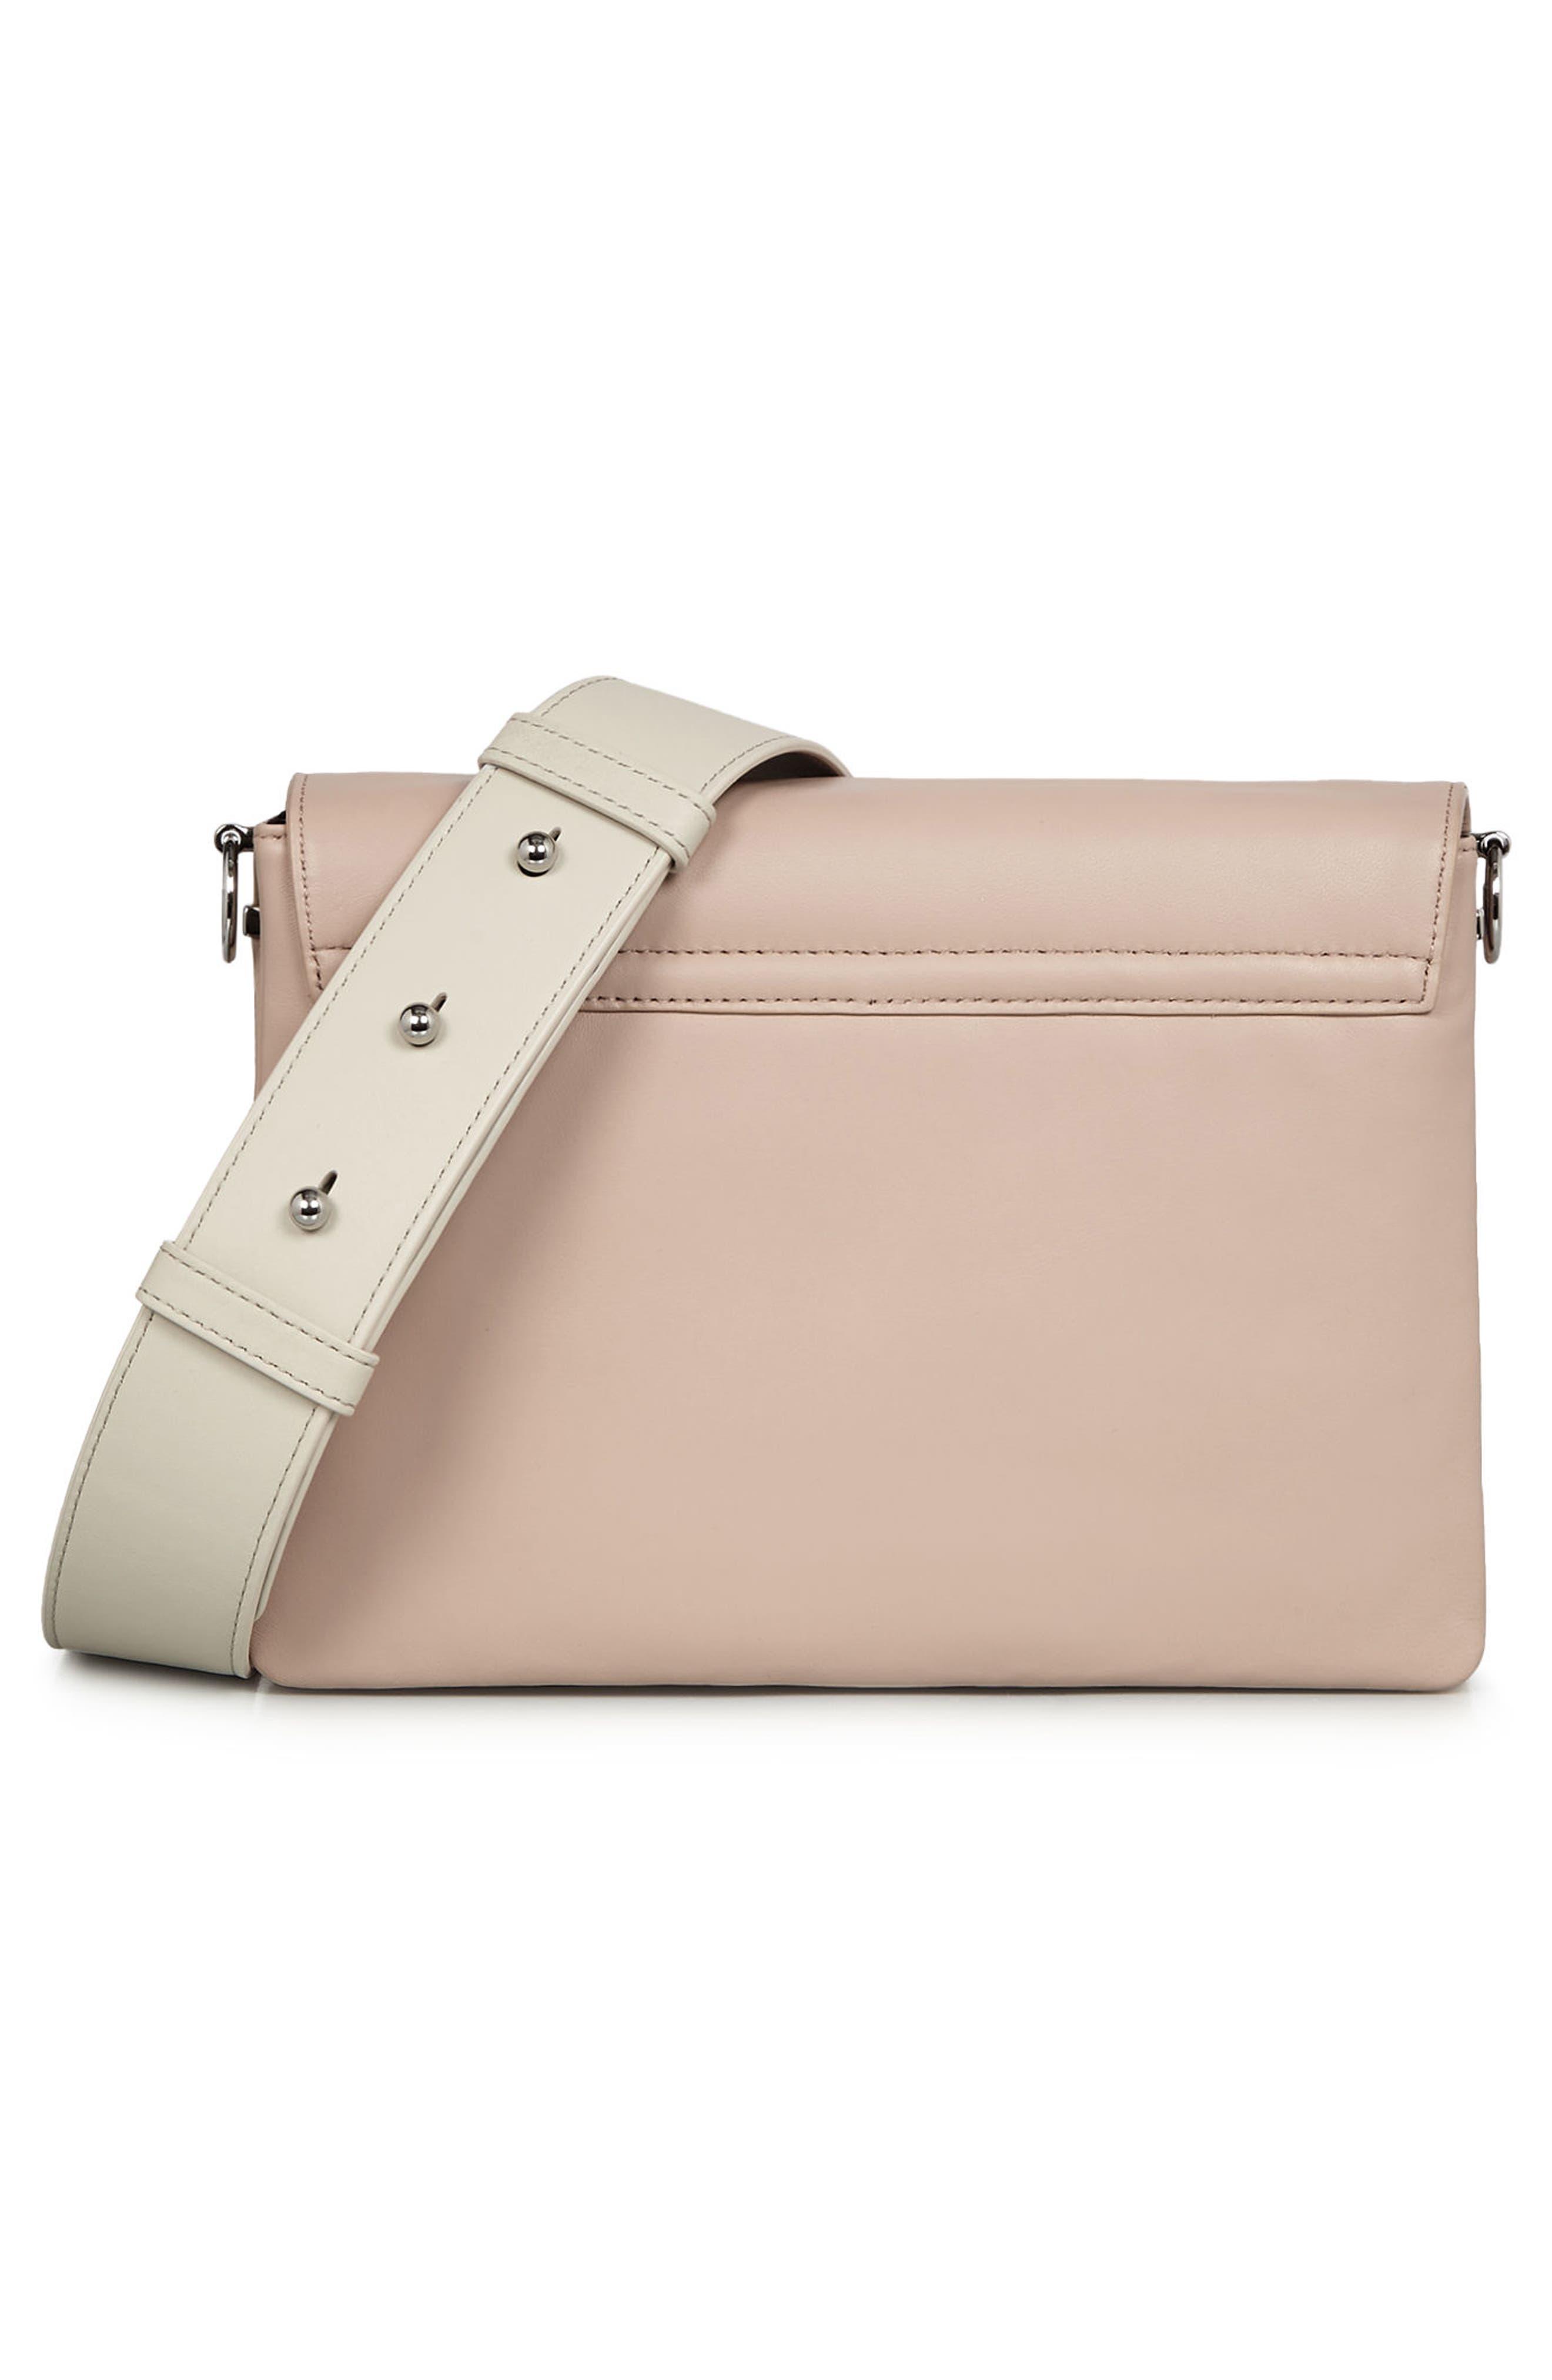 Zep Lambskin Leather Box Bag,                             Alternate thumbnail 2, color,                             Natural